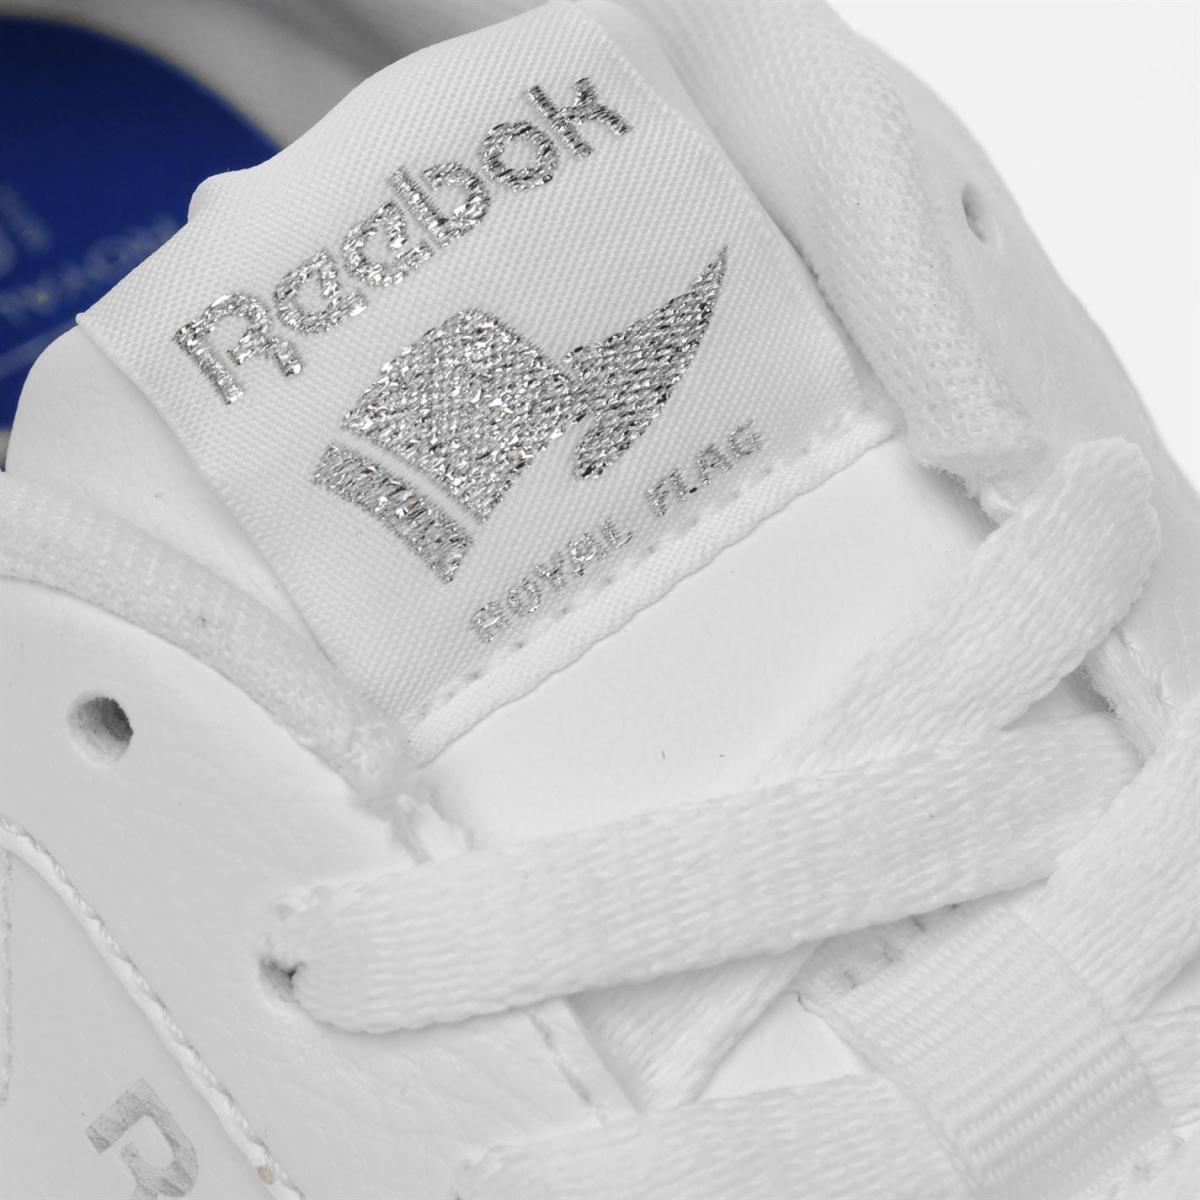 Reebok-Royal-Glide-Turnschuhe-Laufschuhe-Damen-Sneaker-Trainers-Sportschuhe-8001 Indexbild 11